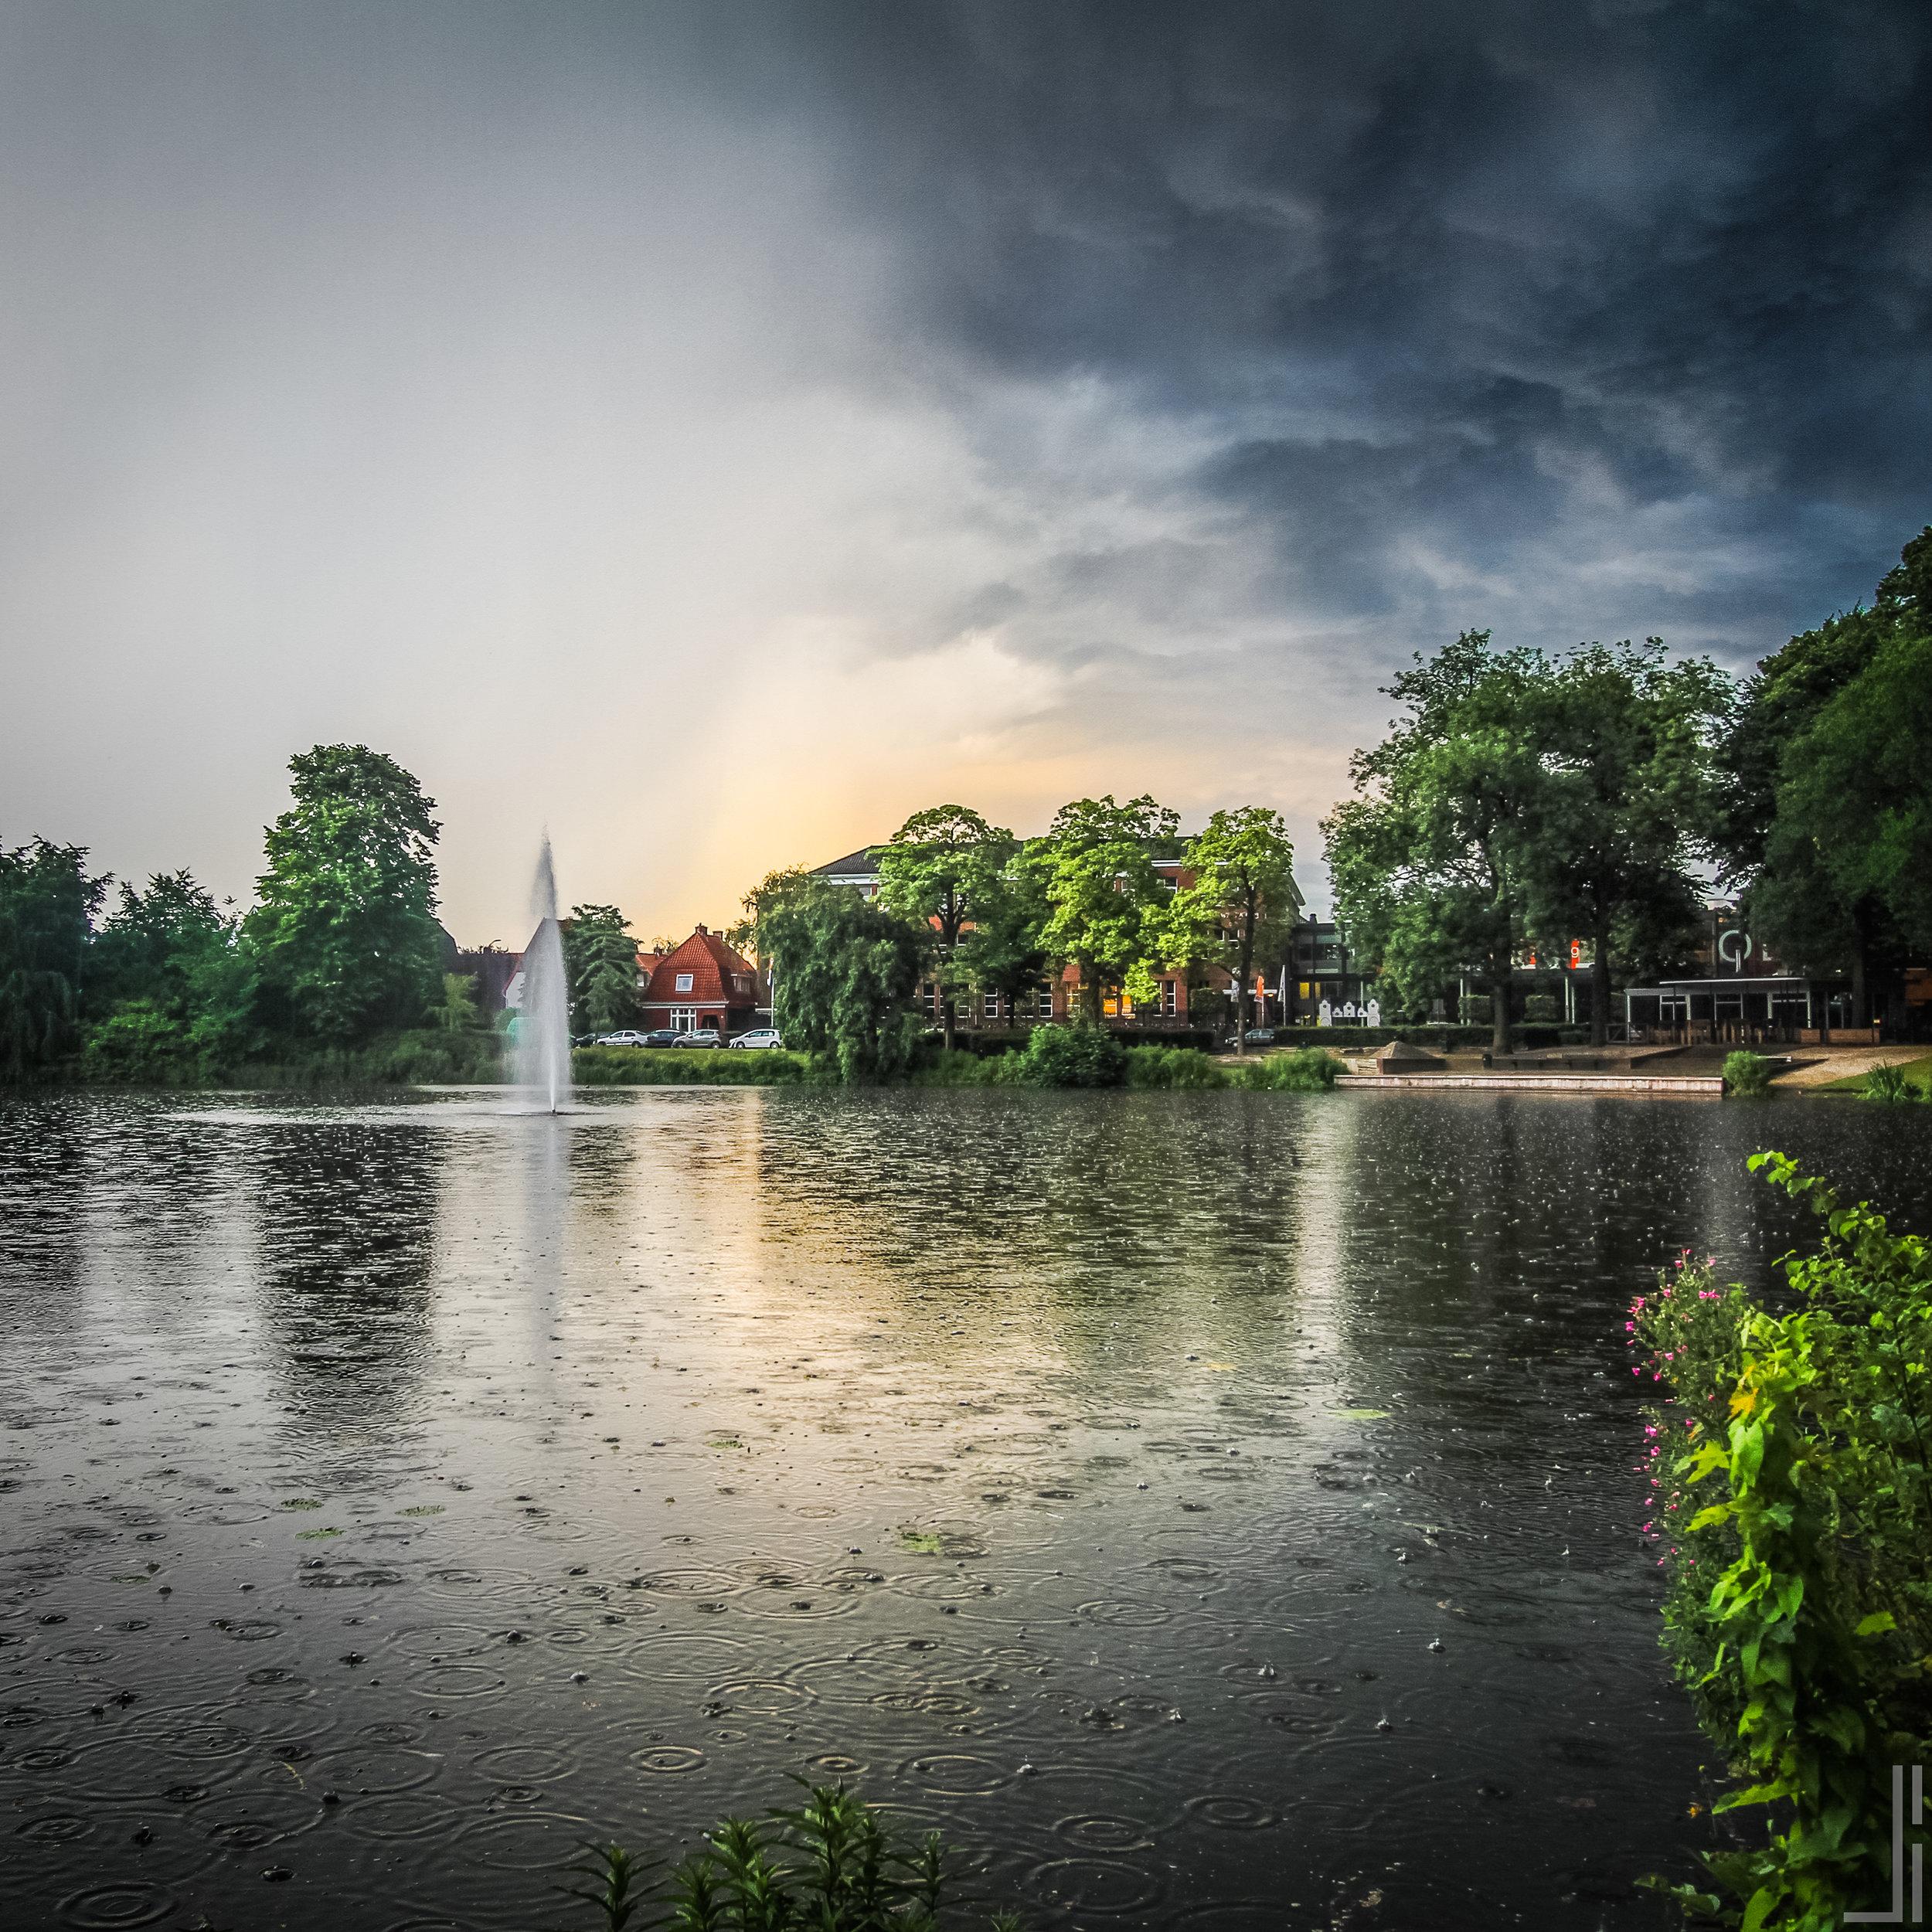 Wilhelminapark Breda - jbax